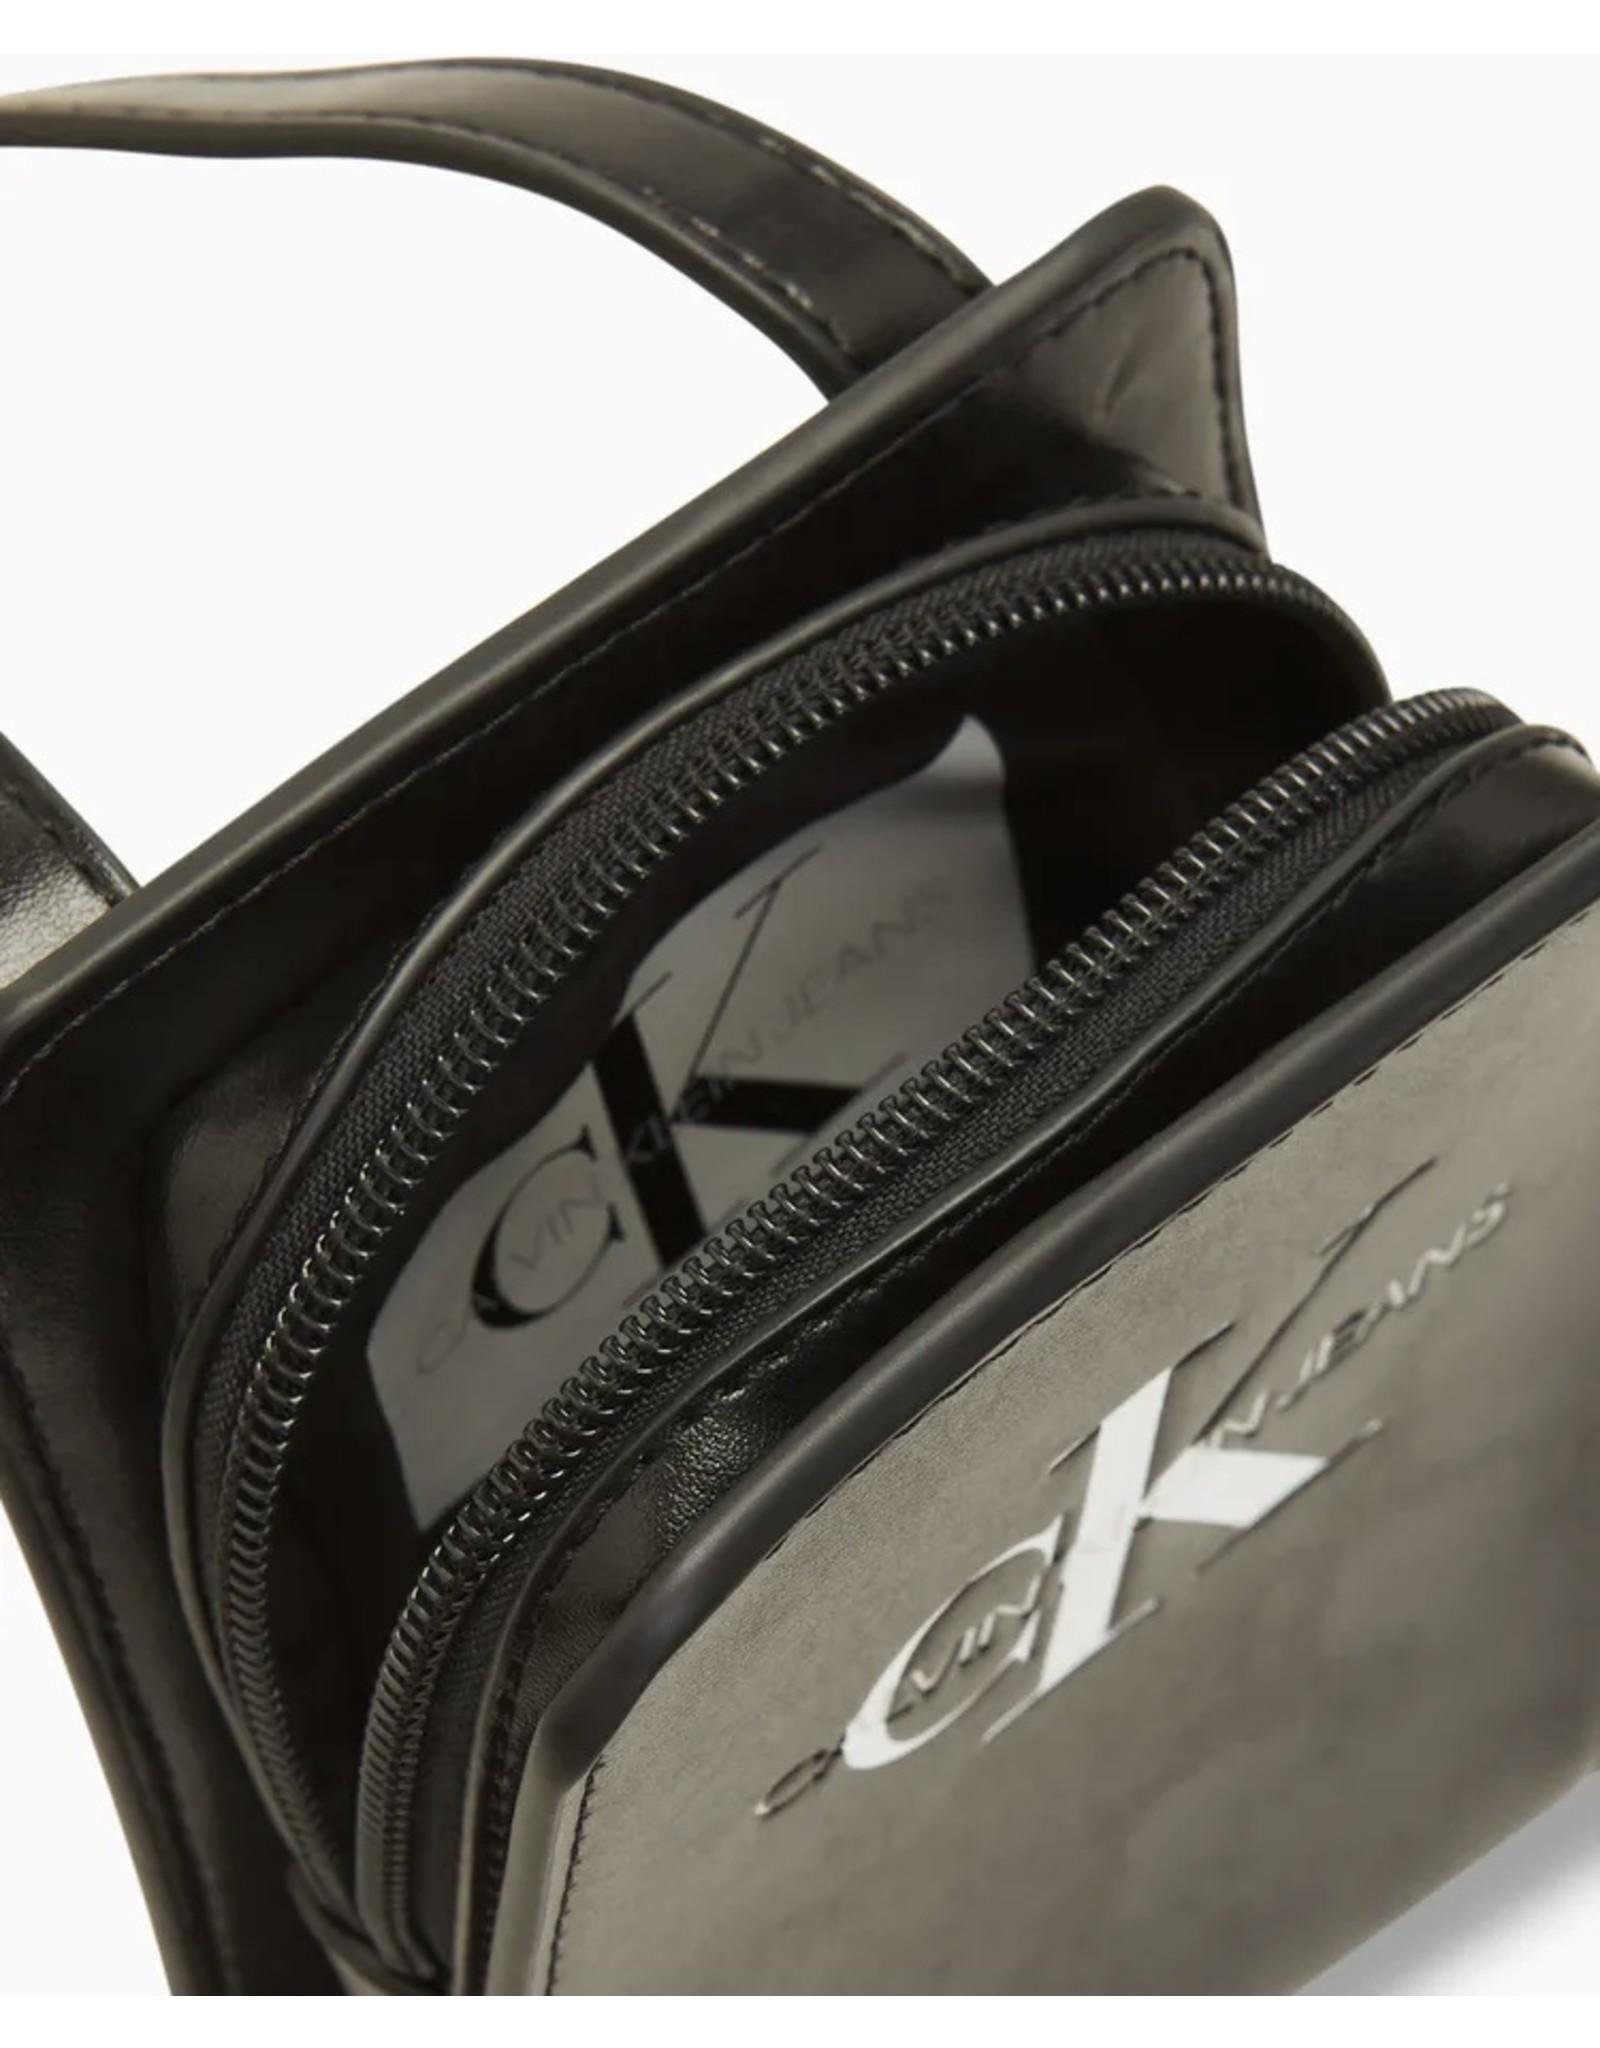 Calvin Klein 00143 Pouch bag